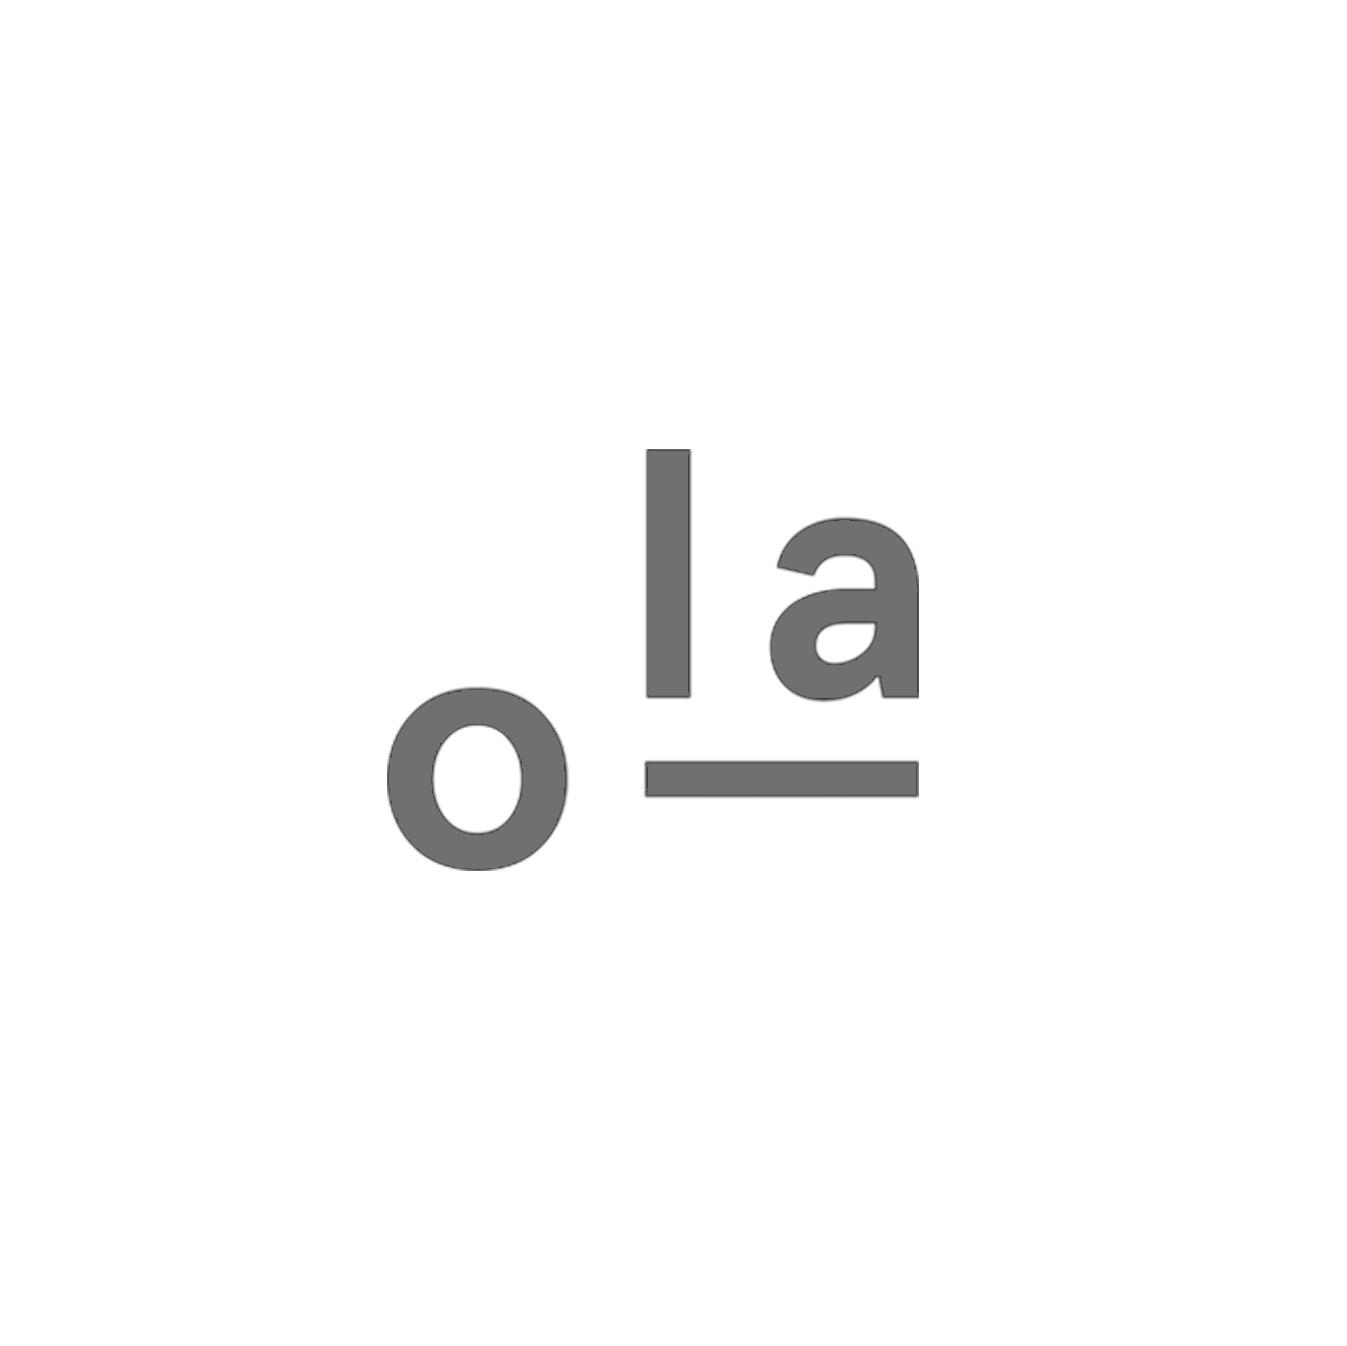 Ola studio logo.png